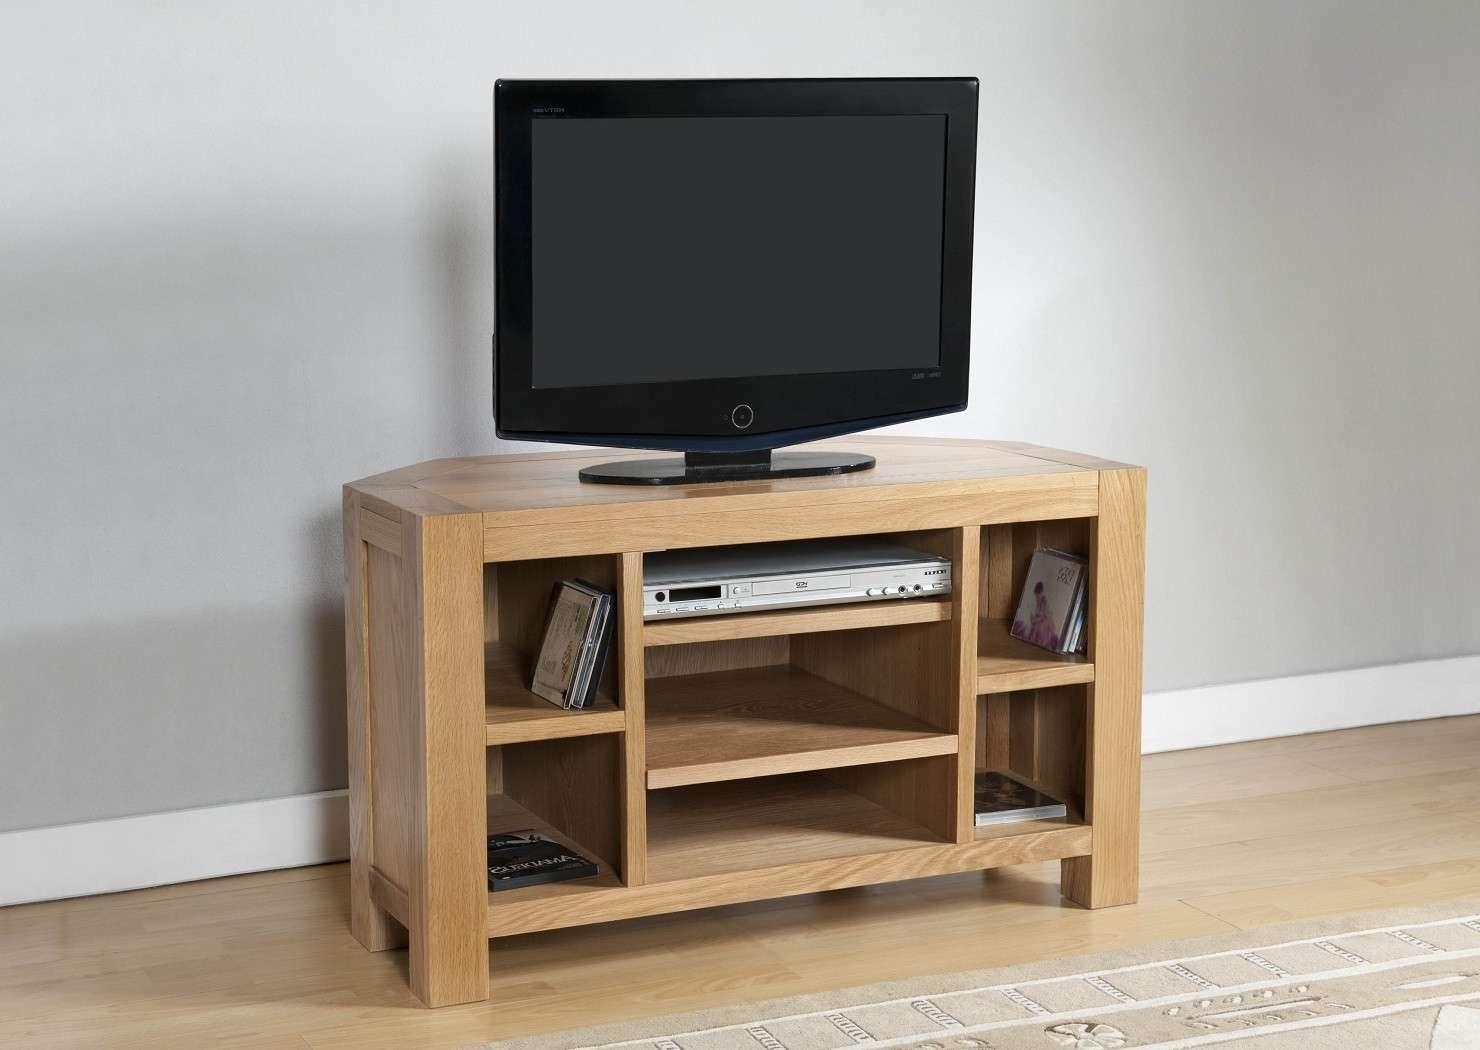 Aylesbury Contemporary Light Oak Corner Tv Unit | Oak Furniture Uk For Light Oak Corner Tv Cabinets (View 1 of 20)